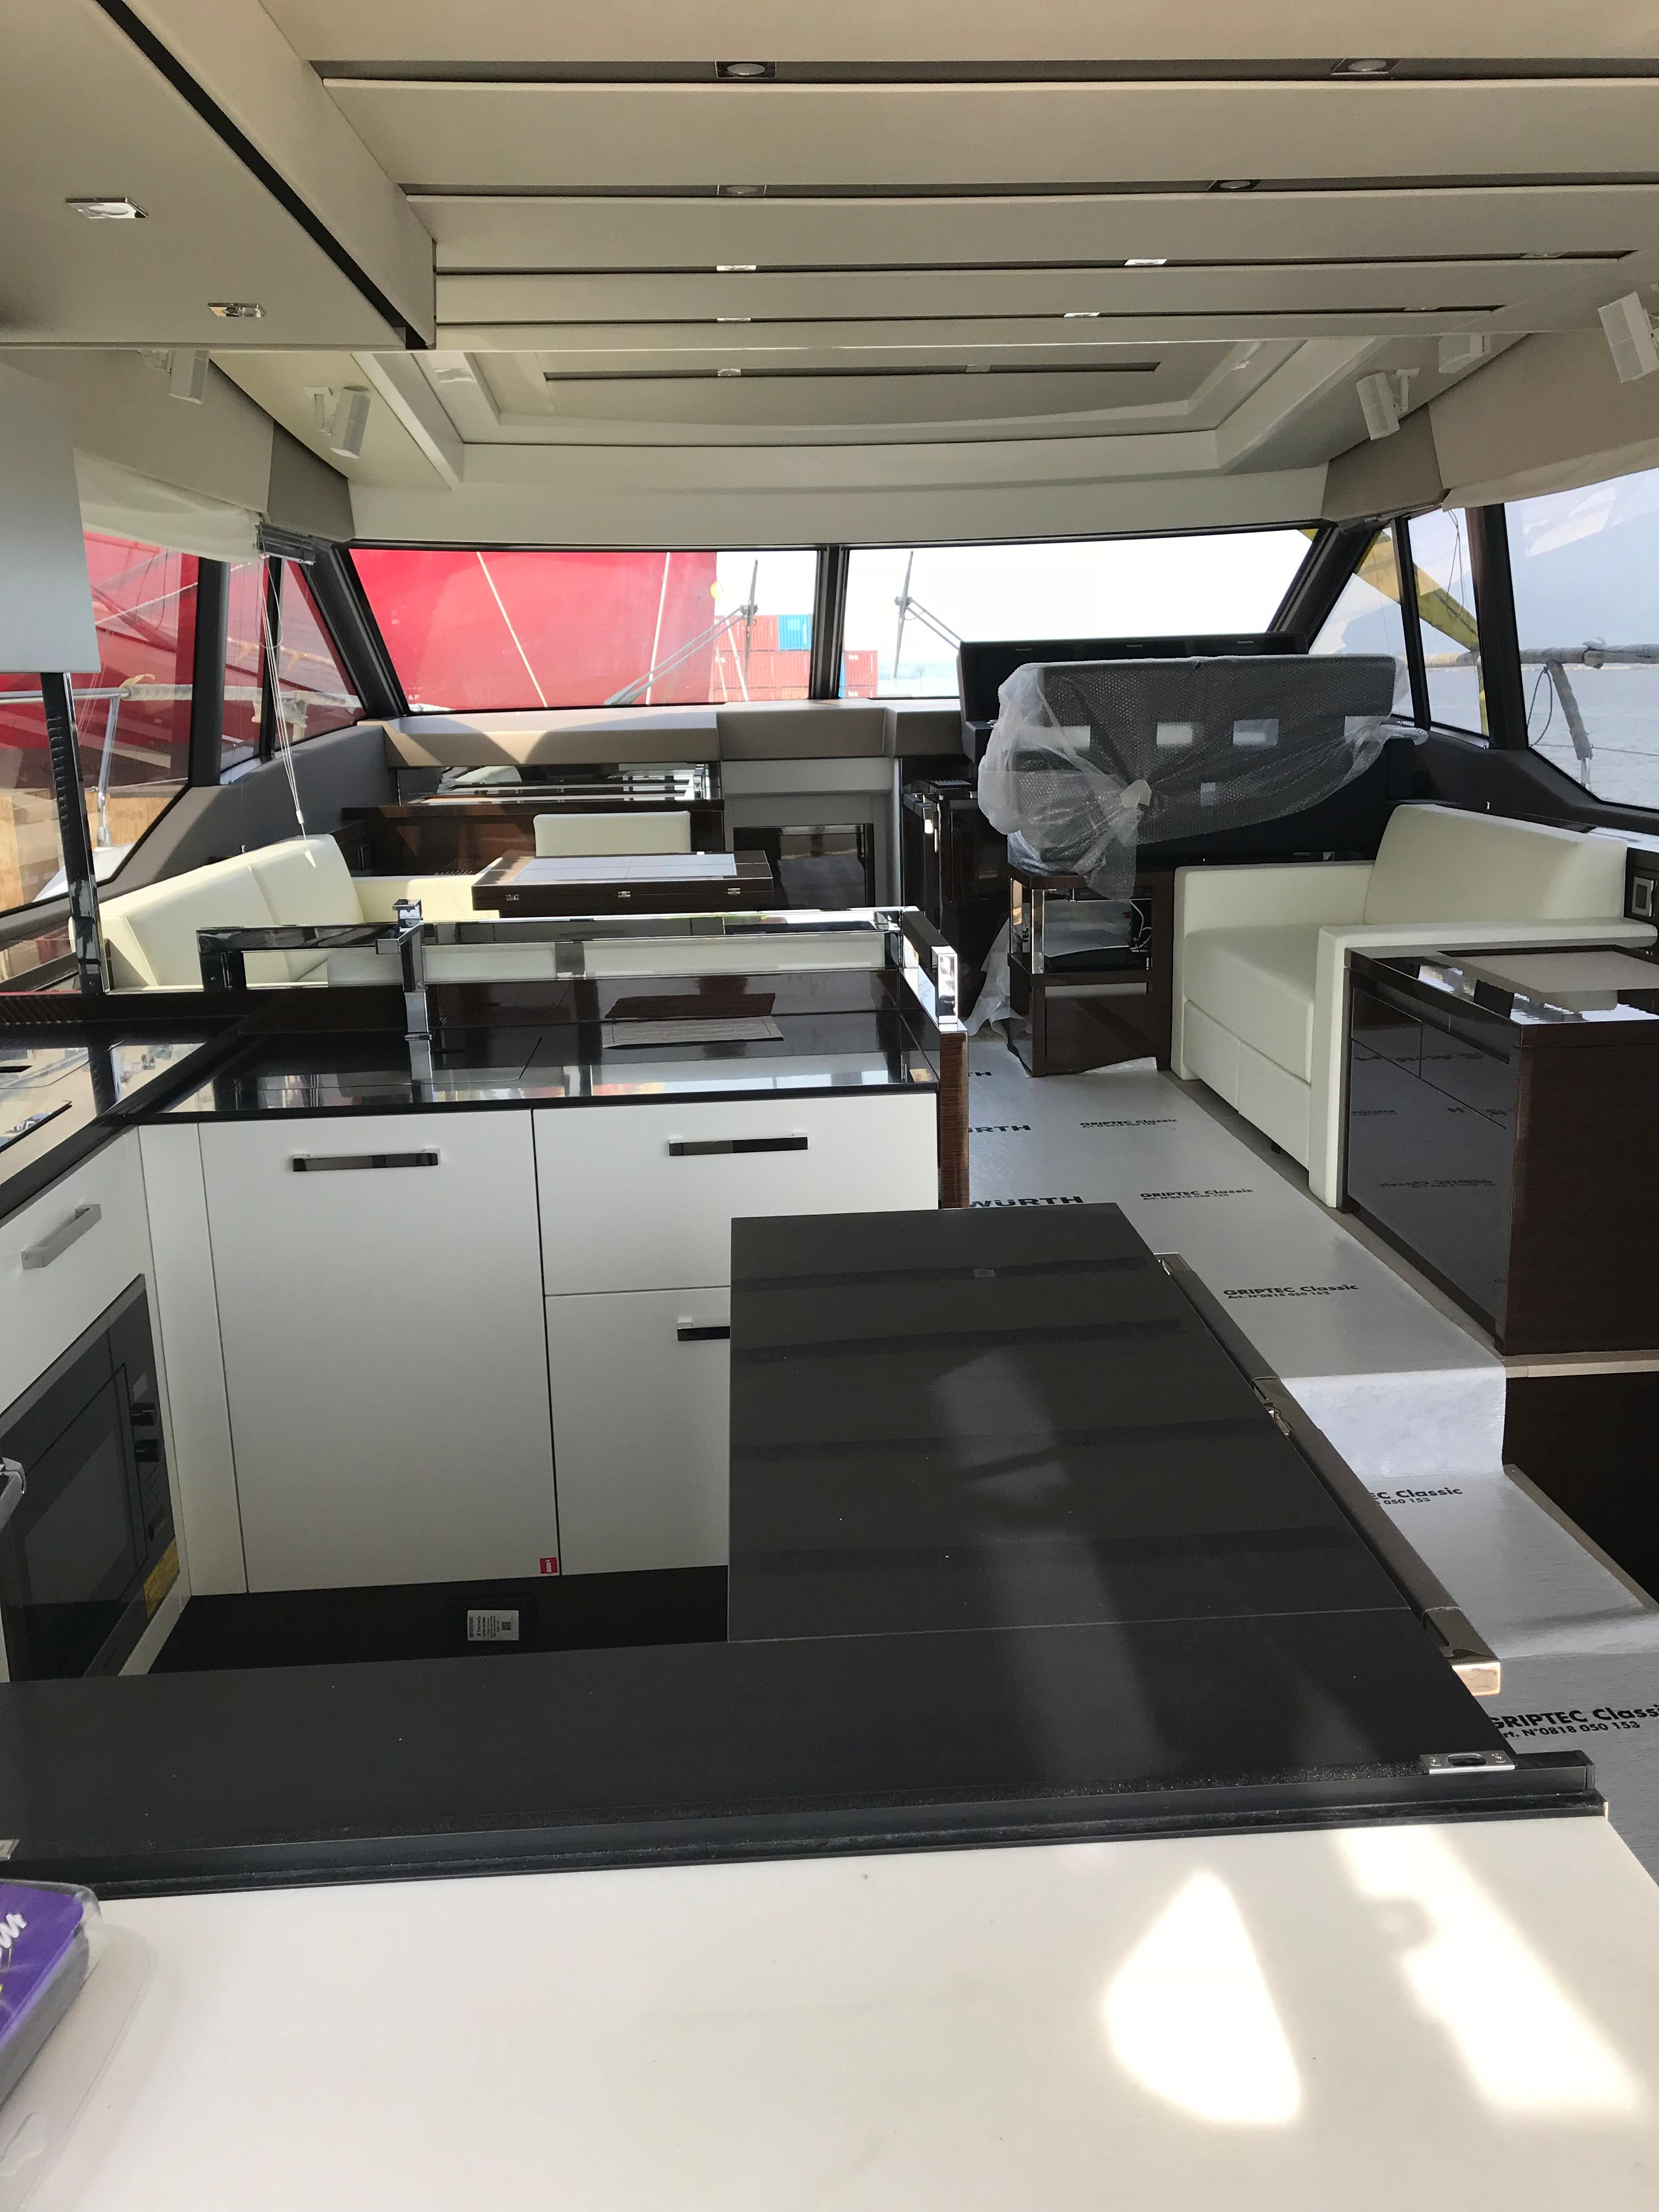 2018 Prestige 630s Coupé Motor Yacht Yacht for Sale in ...